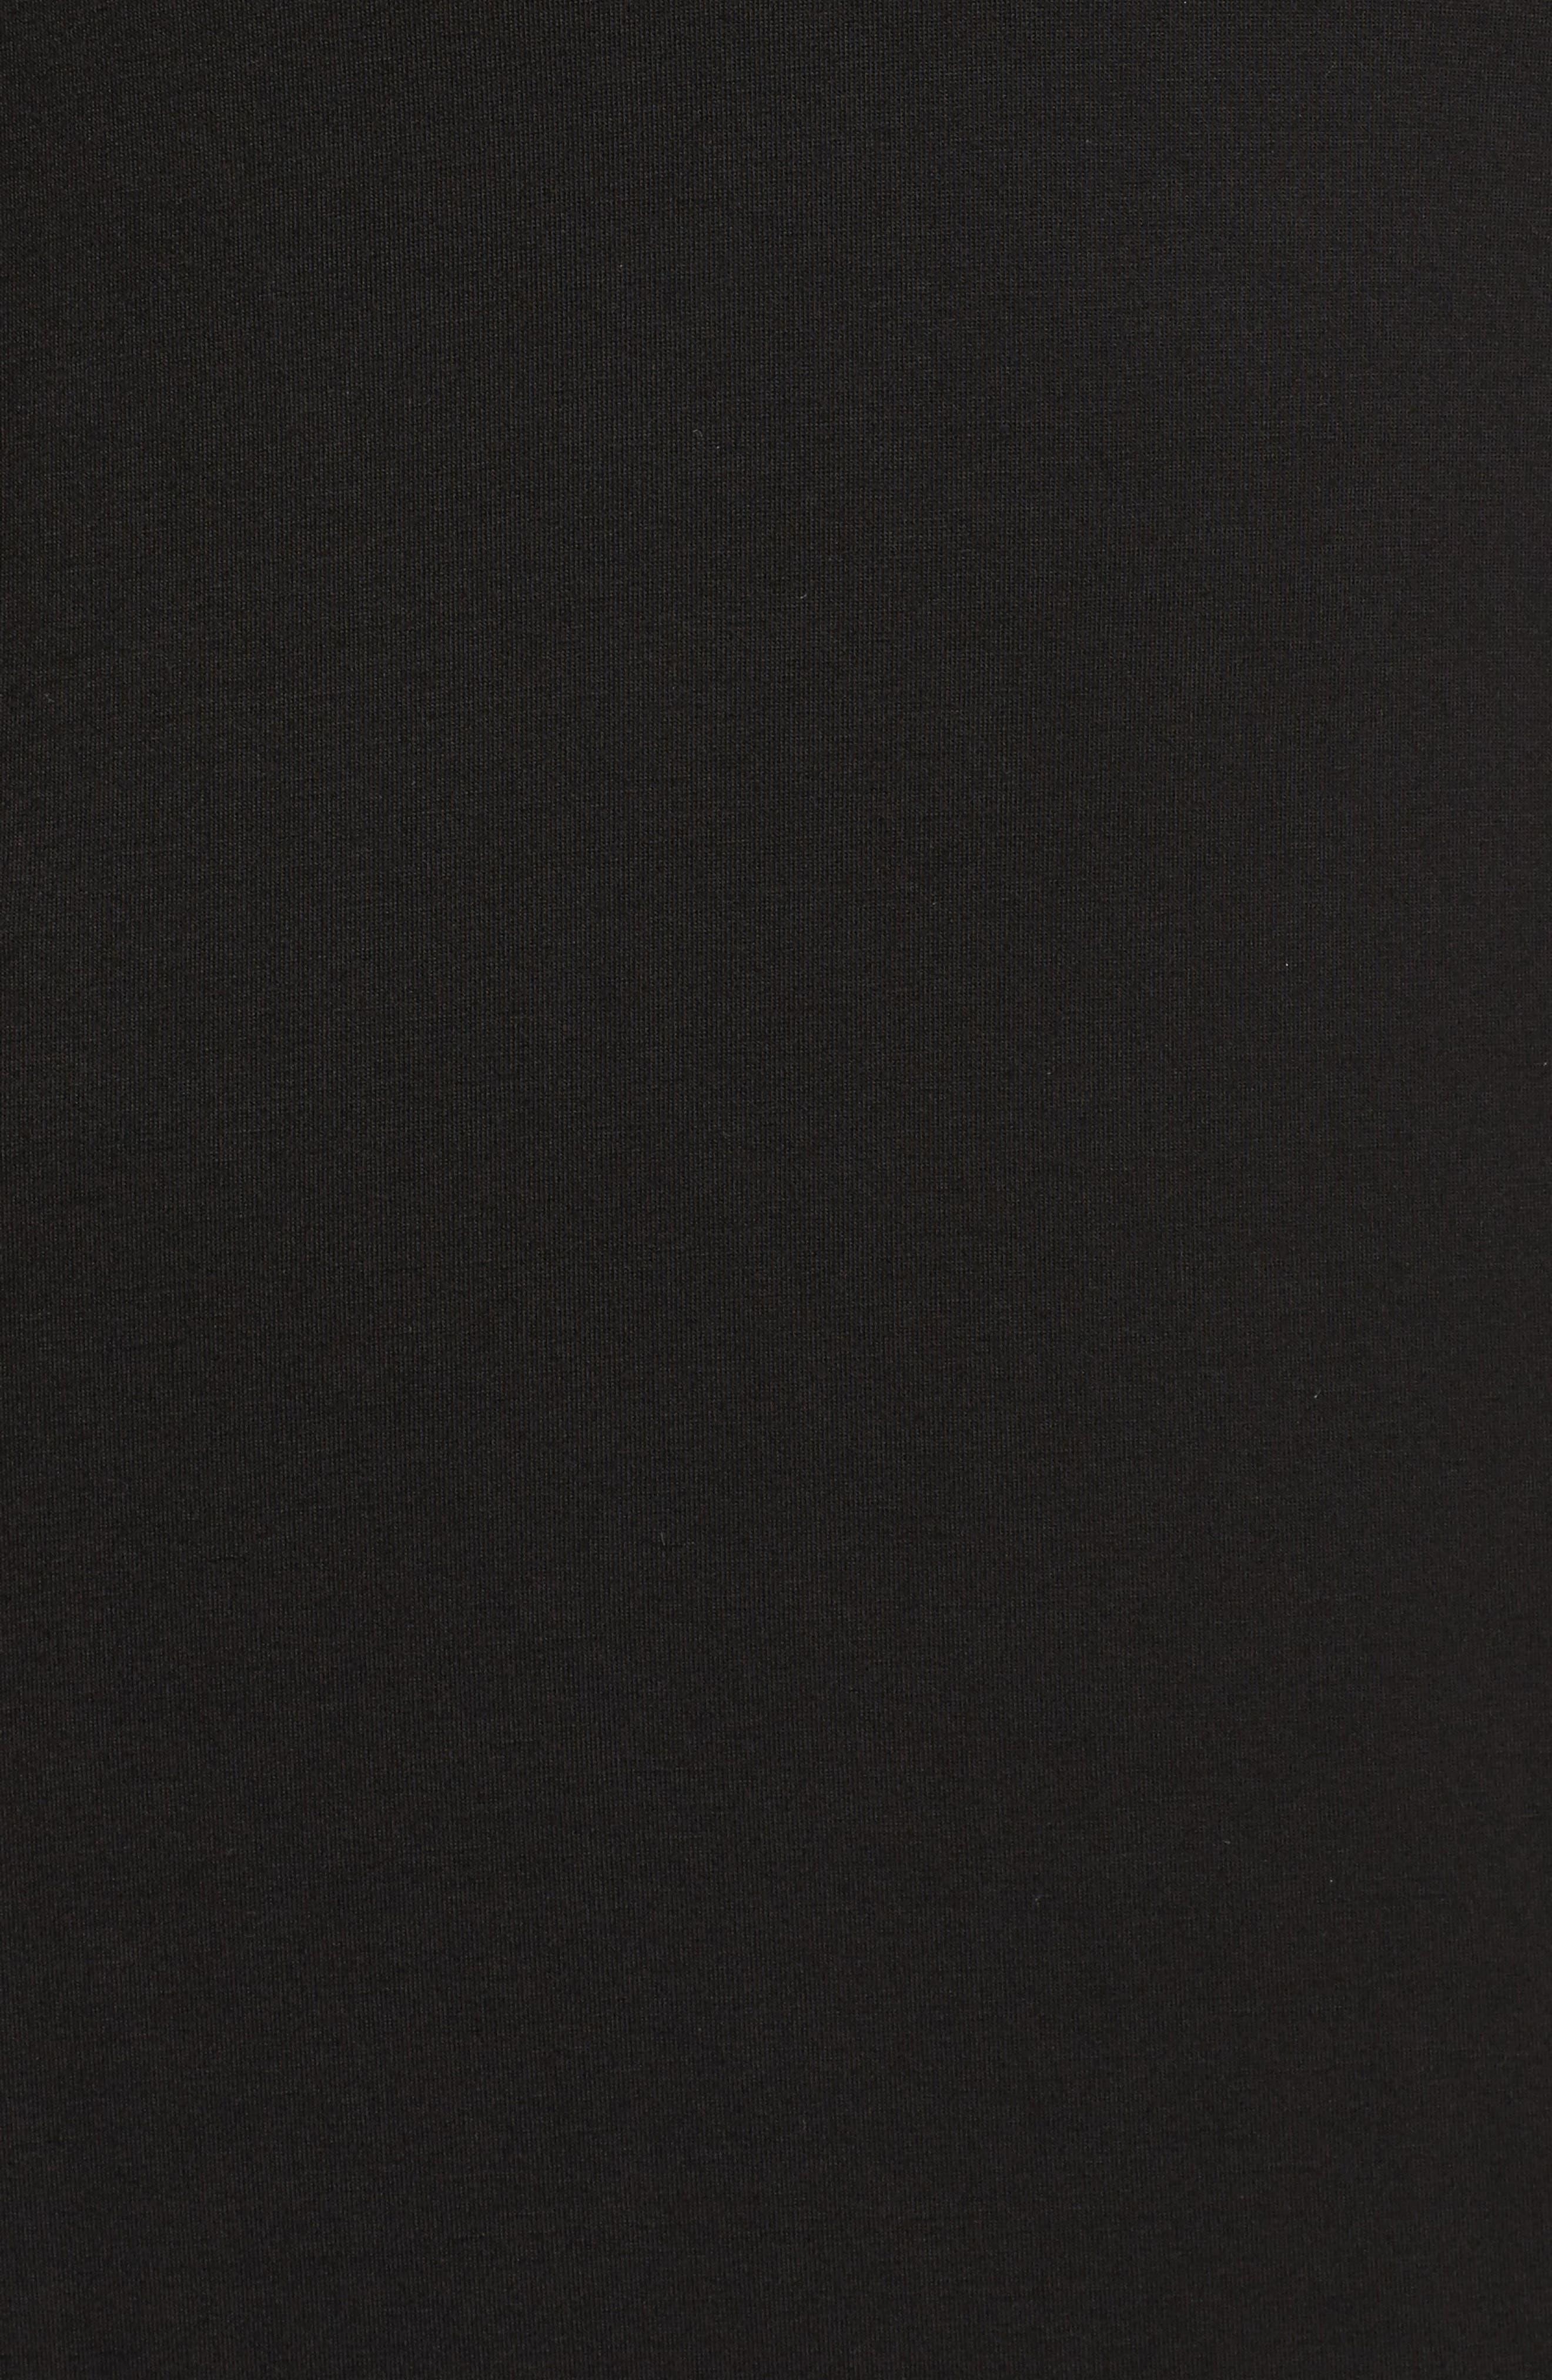 Crisscross Neck T-Shirt Dress,                             Alternate thumbnail 5, color,                             Black